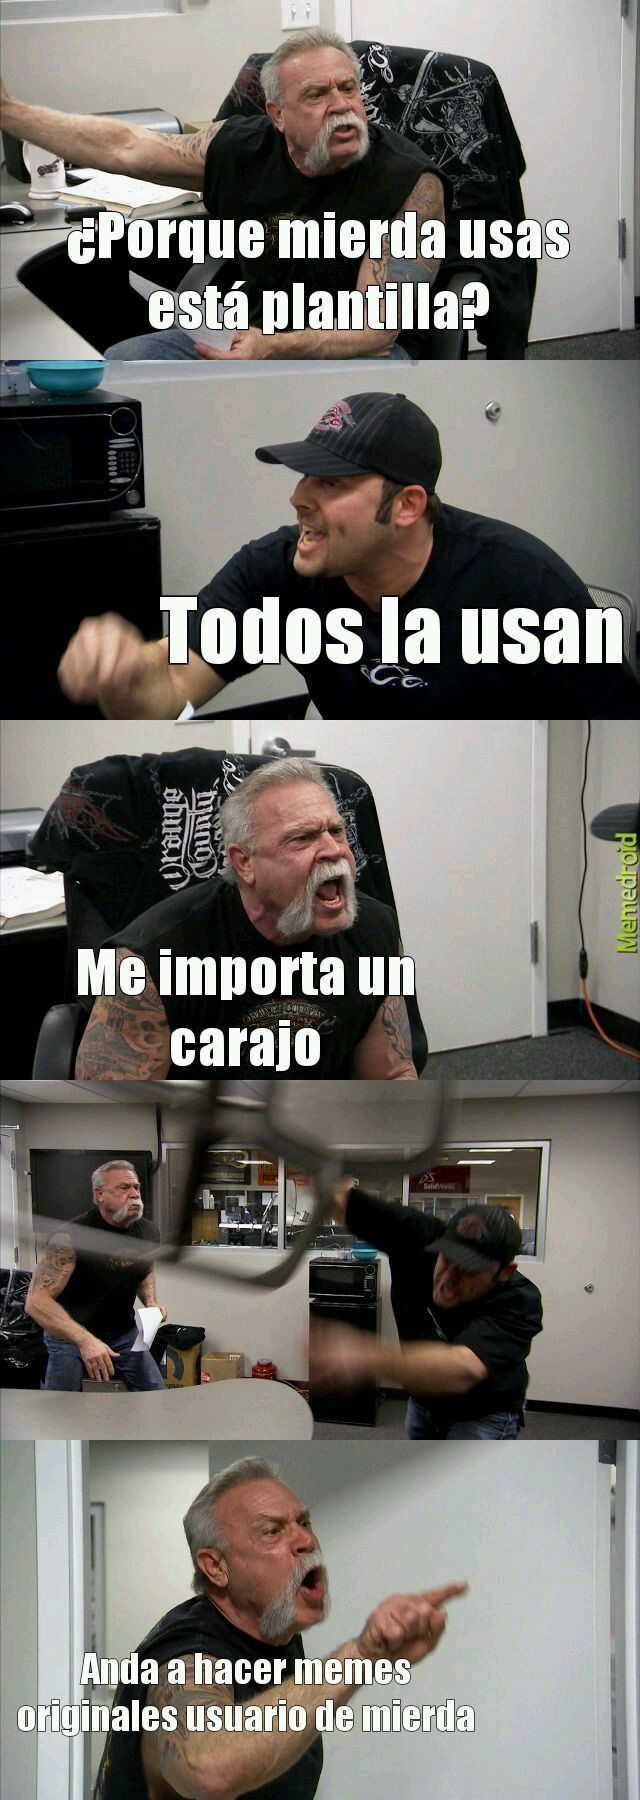 Carajo - meme